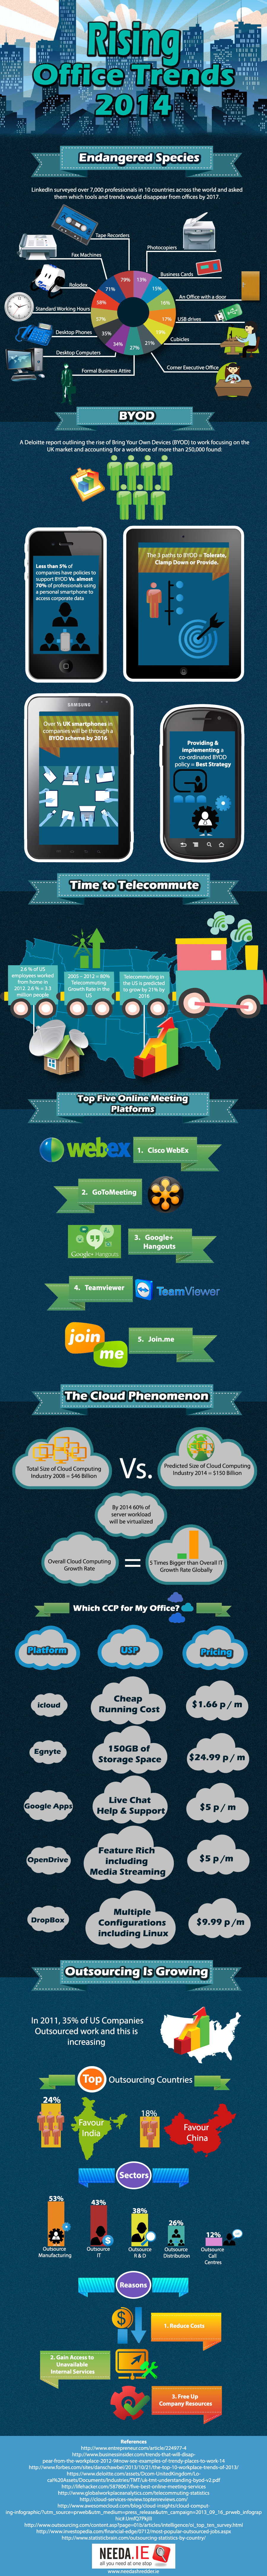 Rising Office Treands 2014-Best Infograph